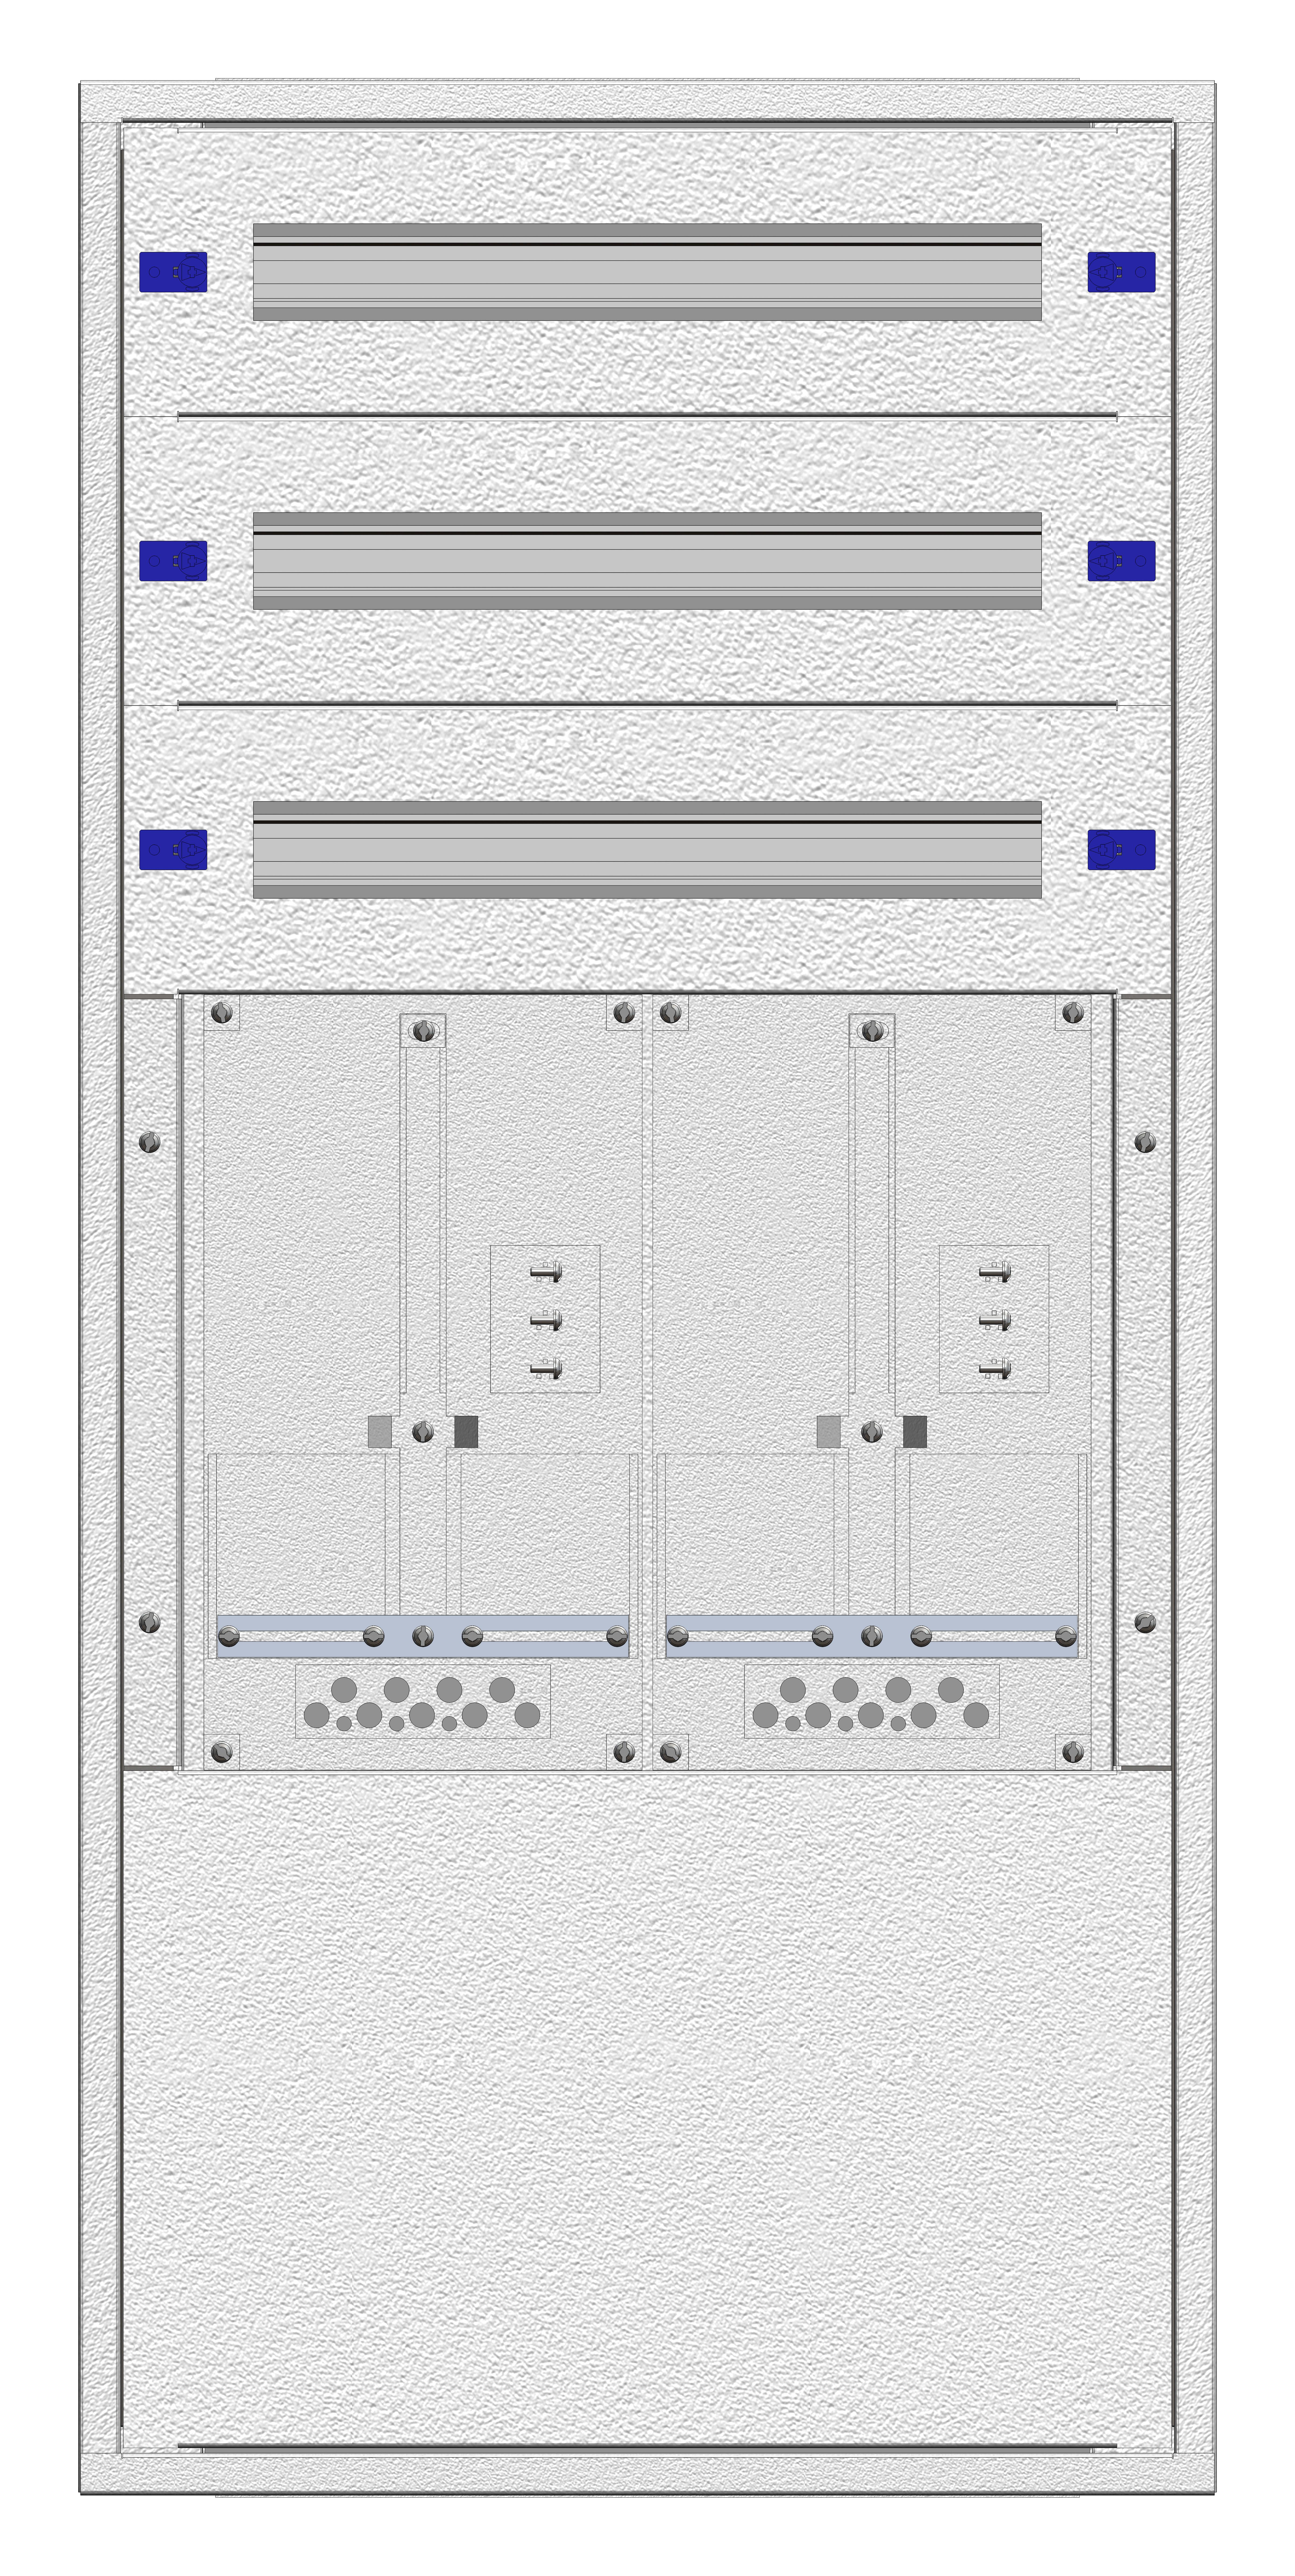 1 Stk Aufputz-Zählerverteiler 2A-24E/NOE 2ZP, H1195B590T250mm IL160224NS